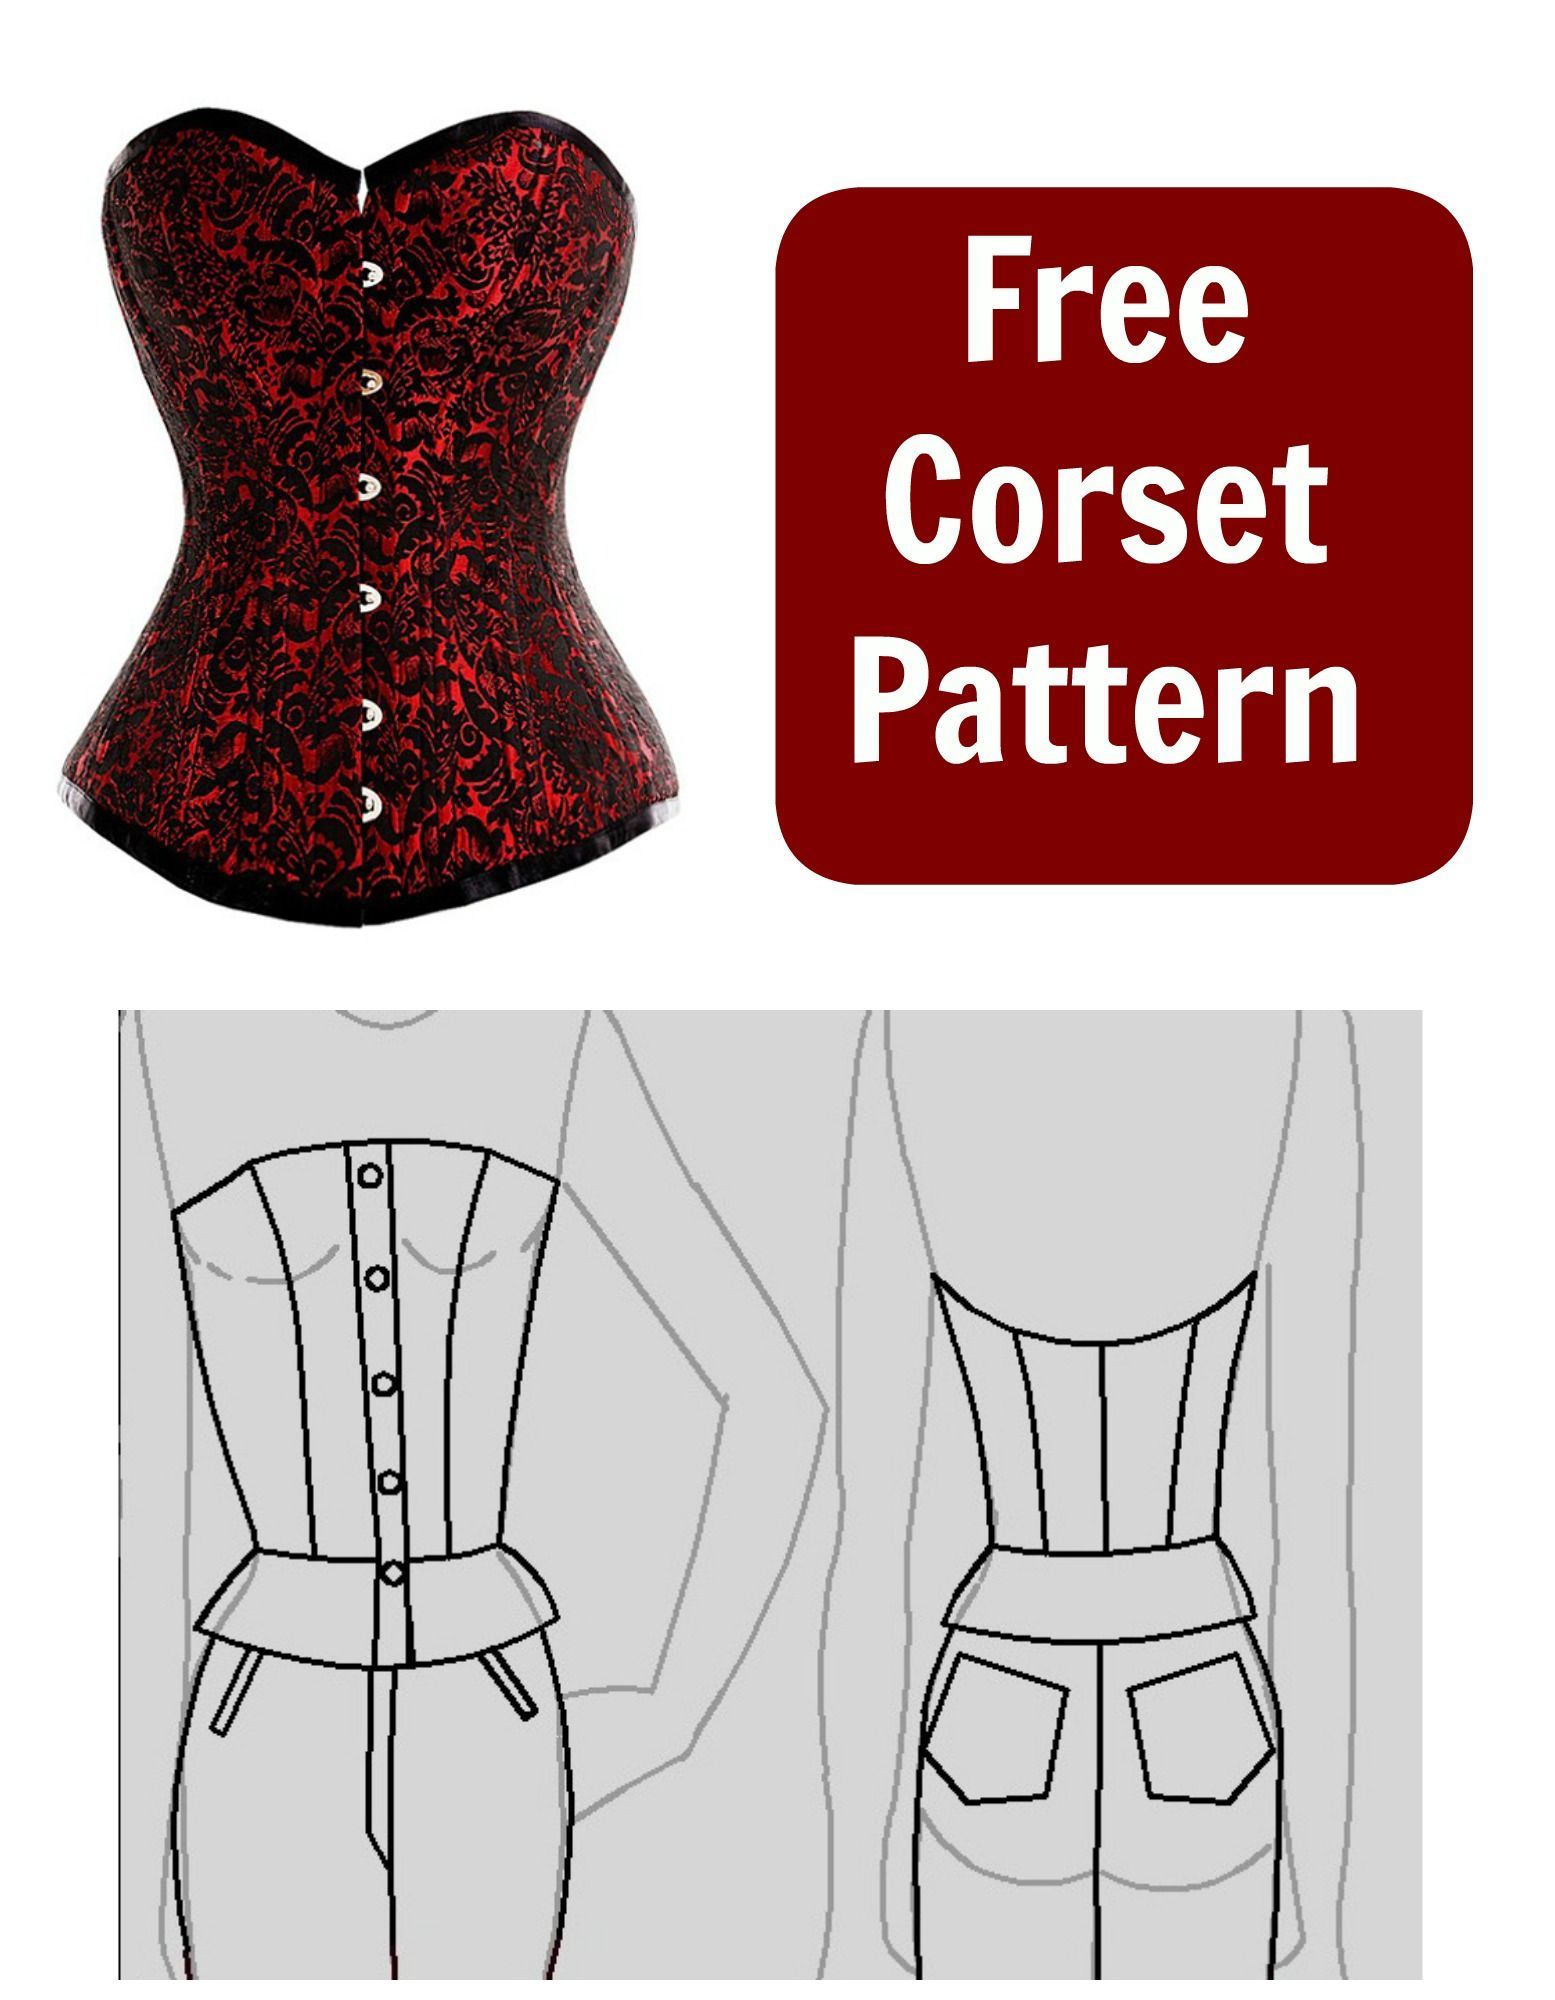 Free corset pattern corset pattern corset and spaces free corset pattern my handmade space jeuxipadfo Gallery